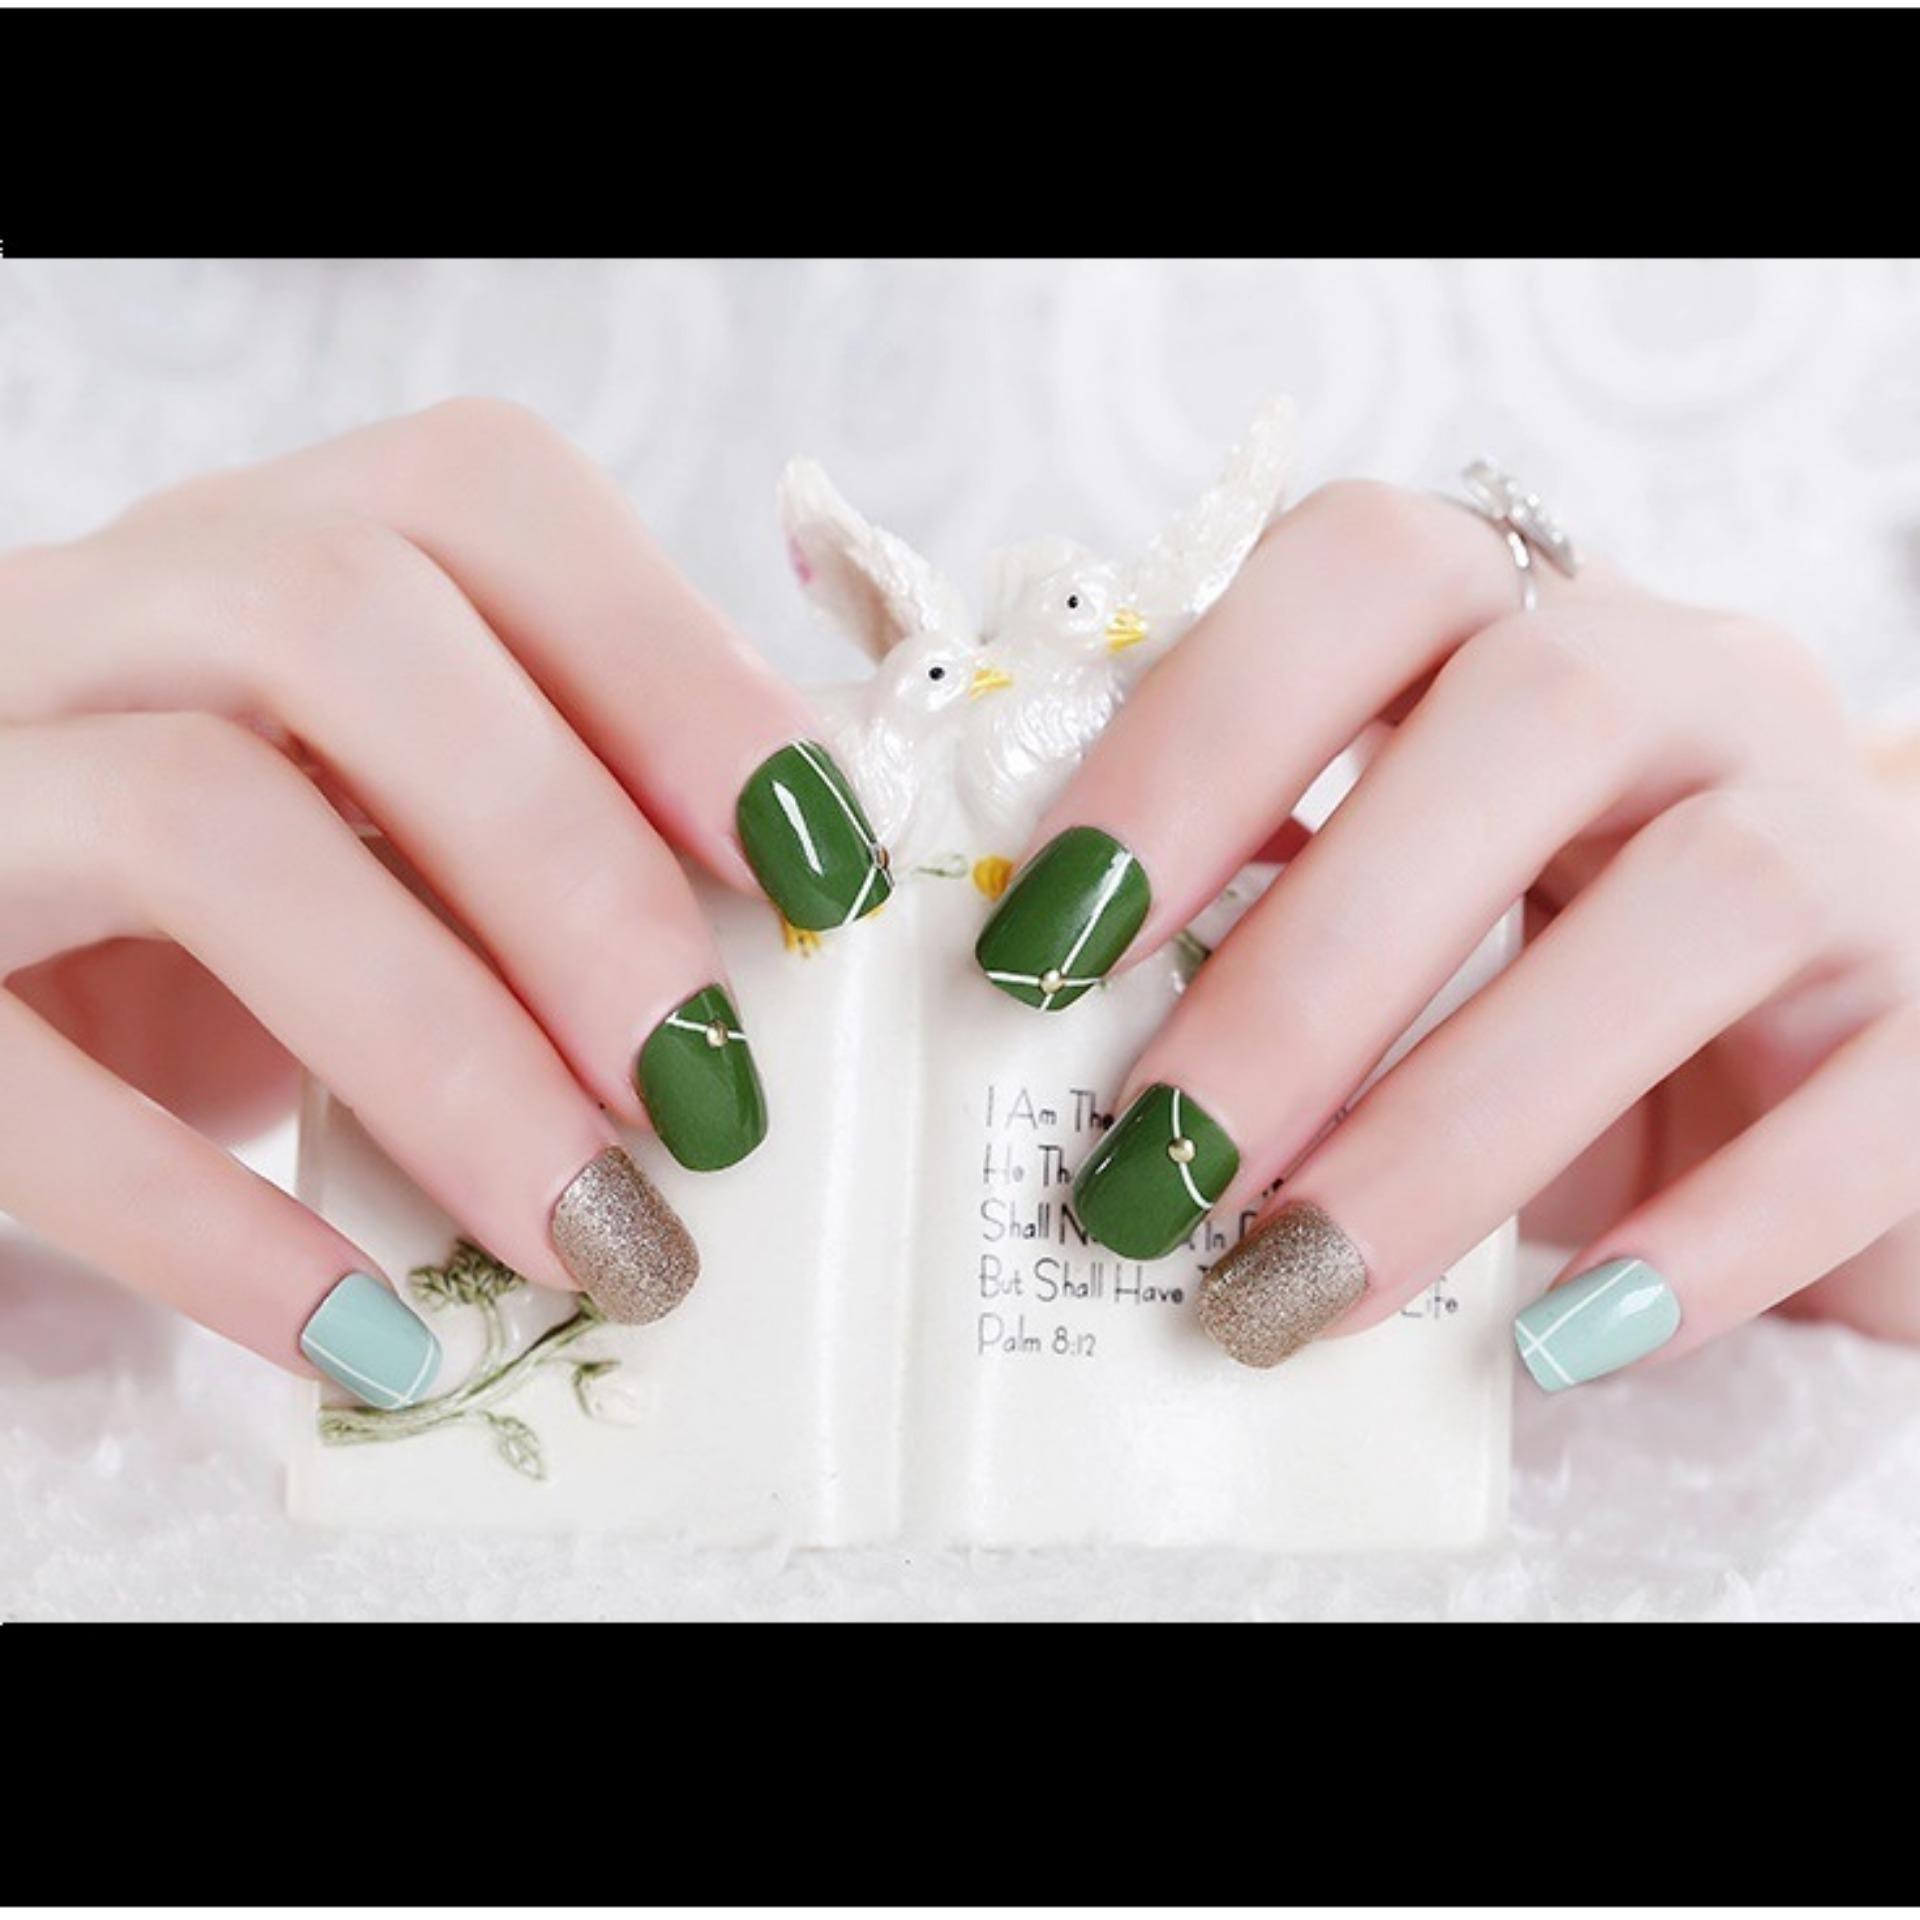 Kelebihan Yunail Shishang Cermin Kopi Warna Kuku Palsu Terkini Jbs Nails Wedding 3d A39 Pengantin A3